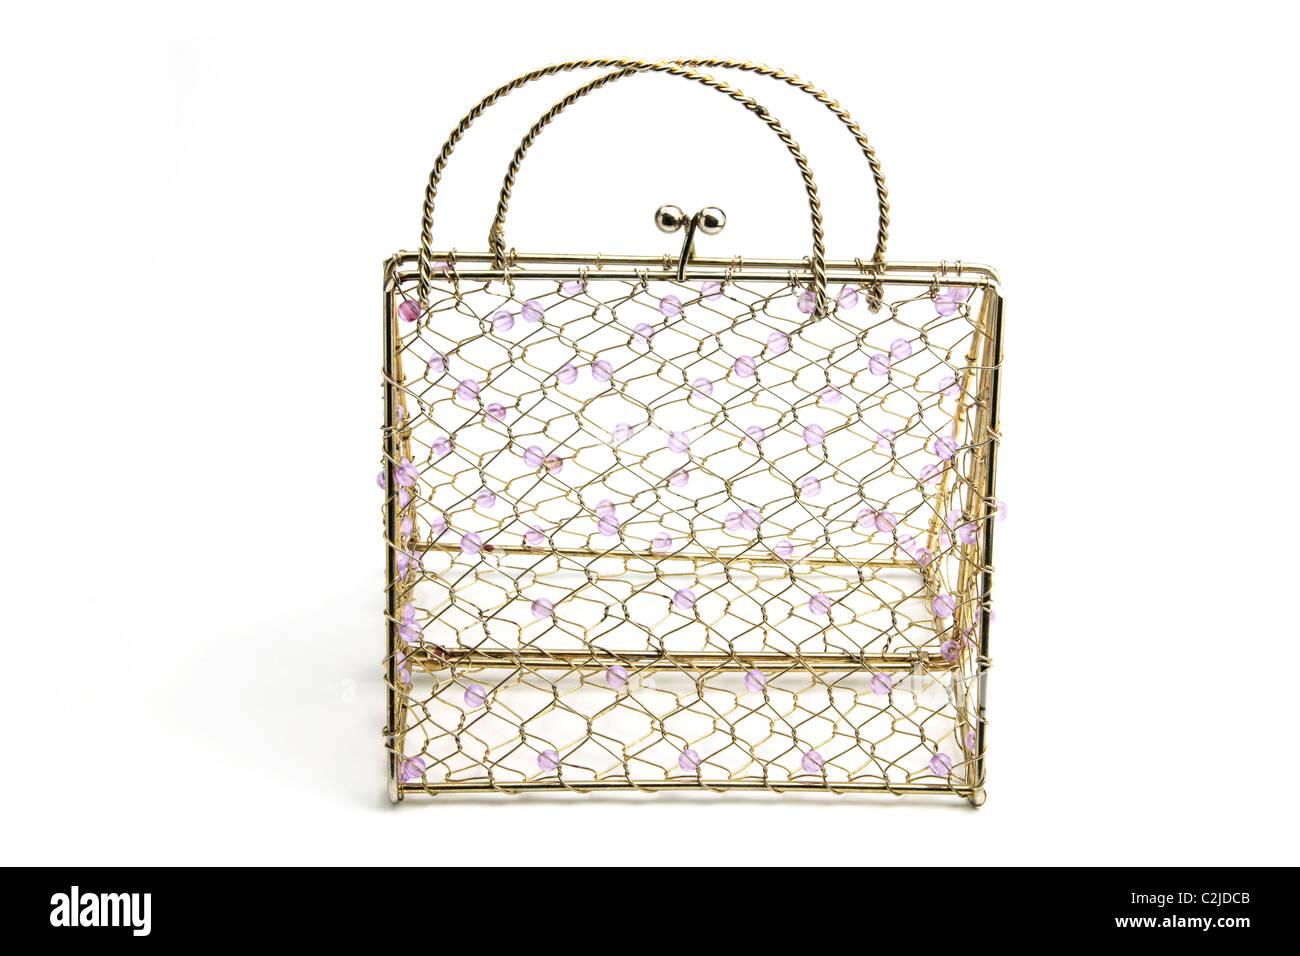 Wire Handbag - Stock Image